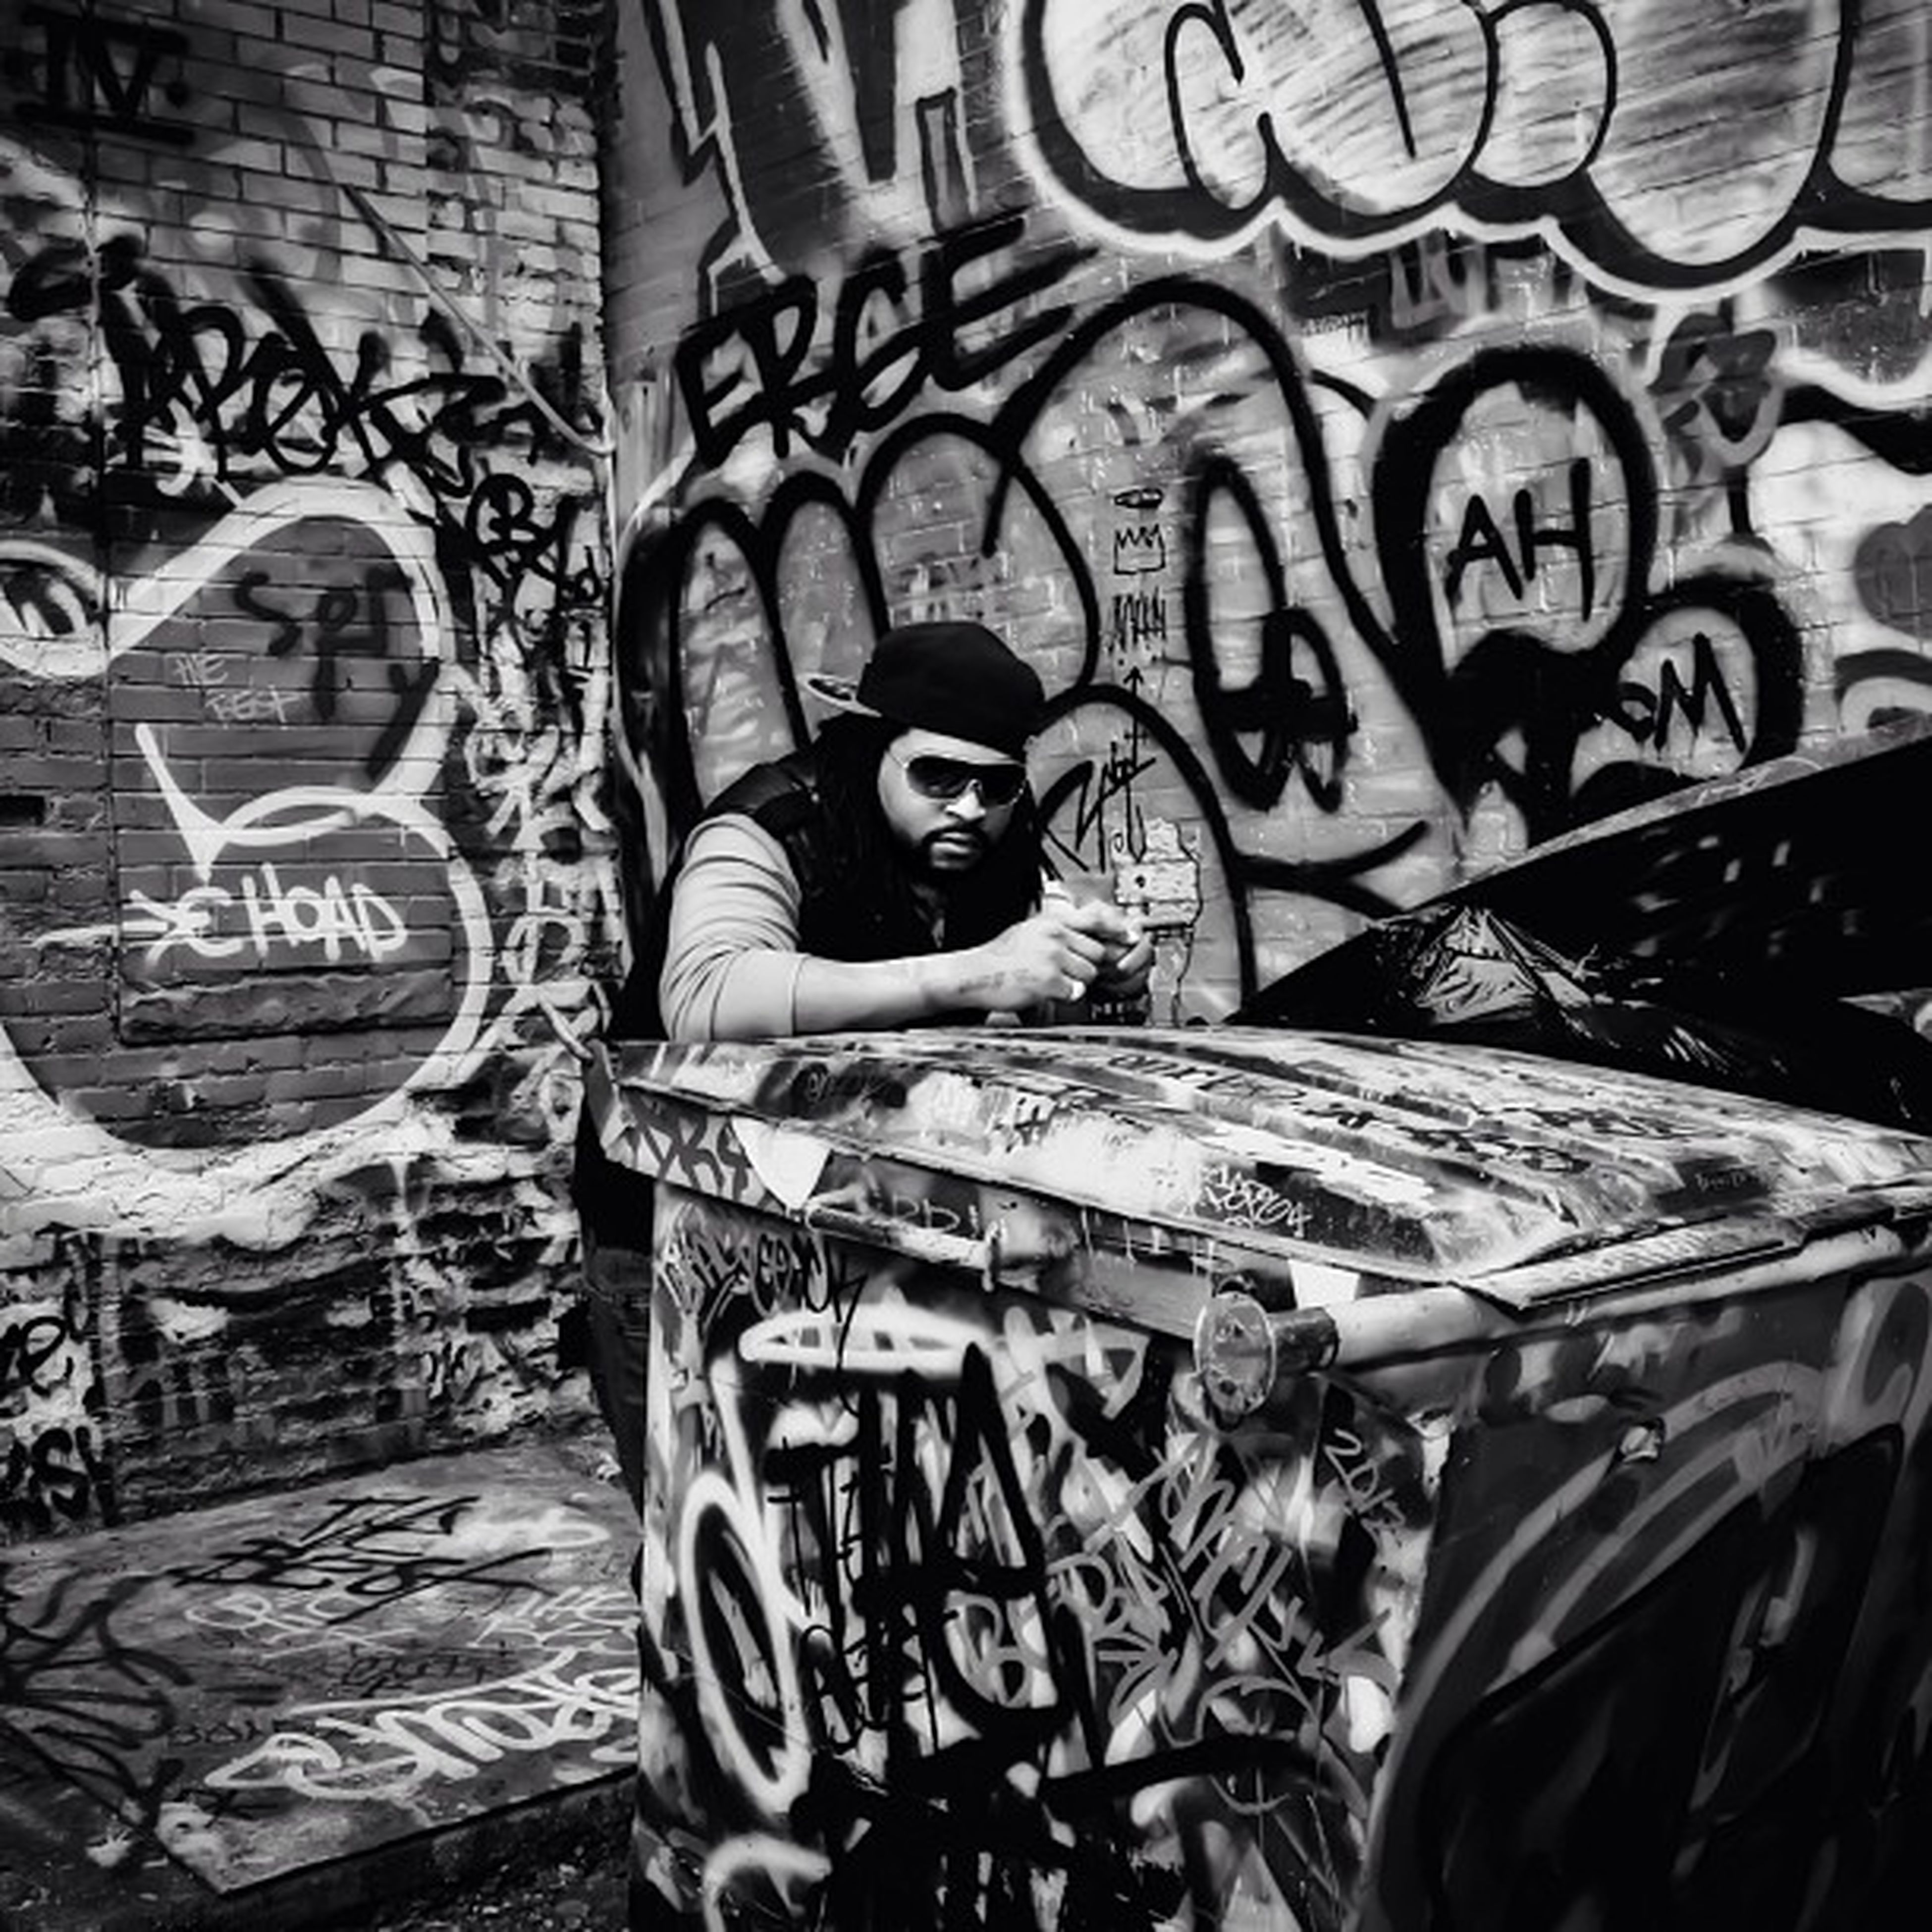 art, art and craft, graffiti, creativity, human representation, built structure, architecture, text, wall - building feature, animal representation, street art, design, building exterior, sculpture, craft, statue, day, mural